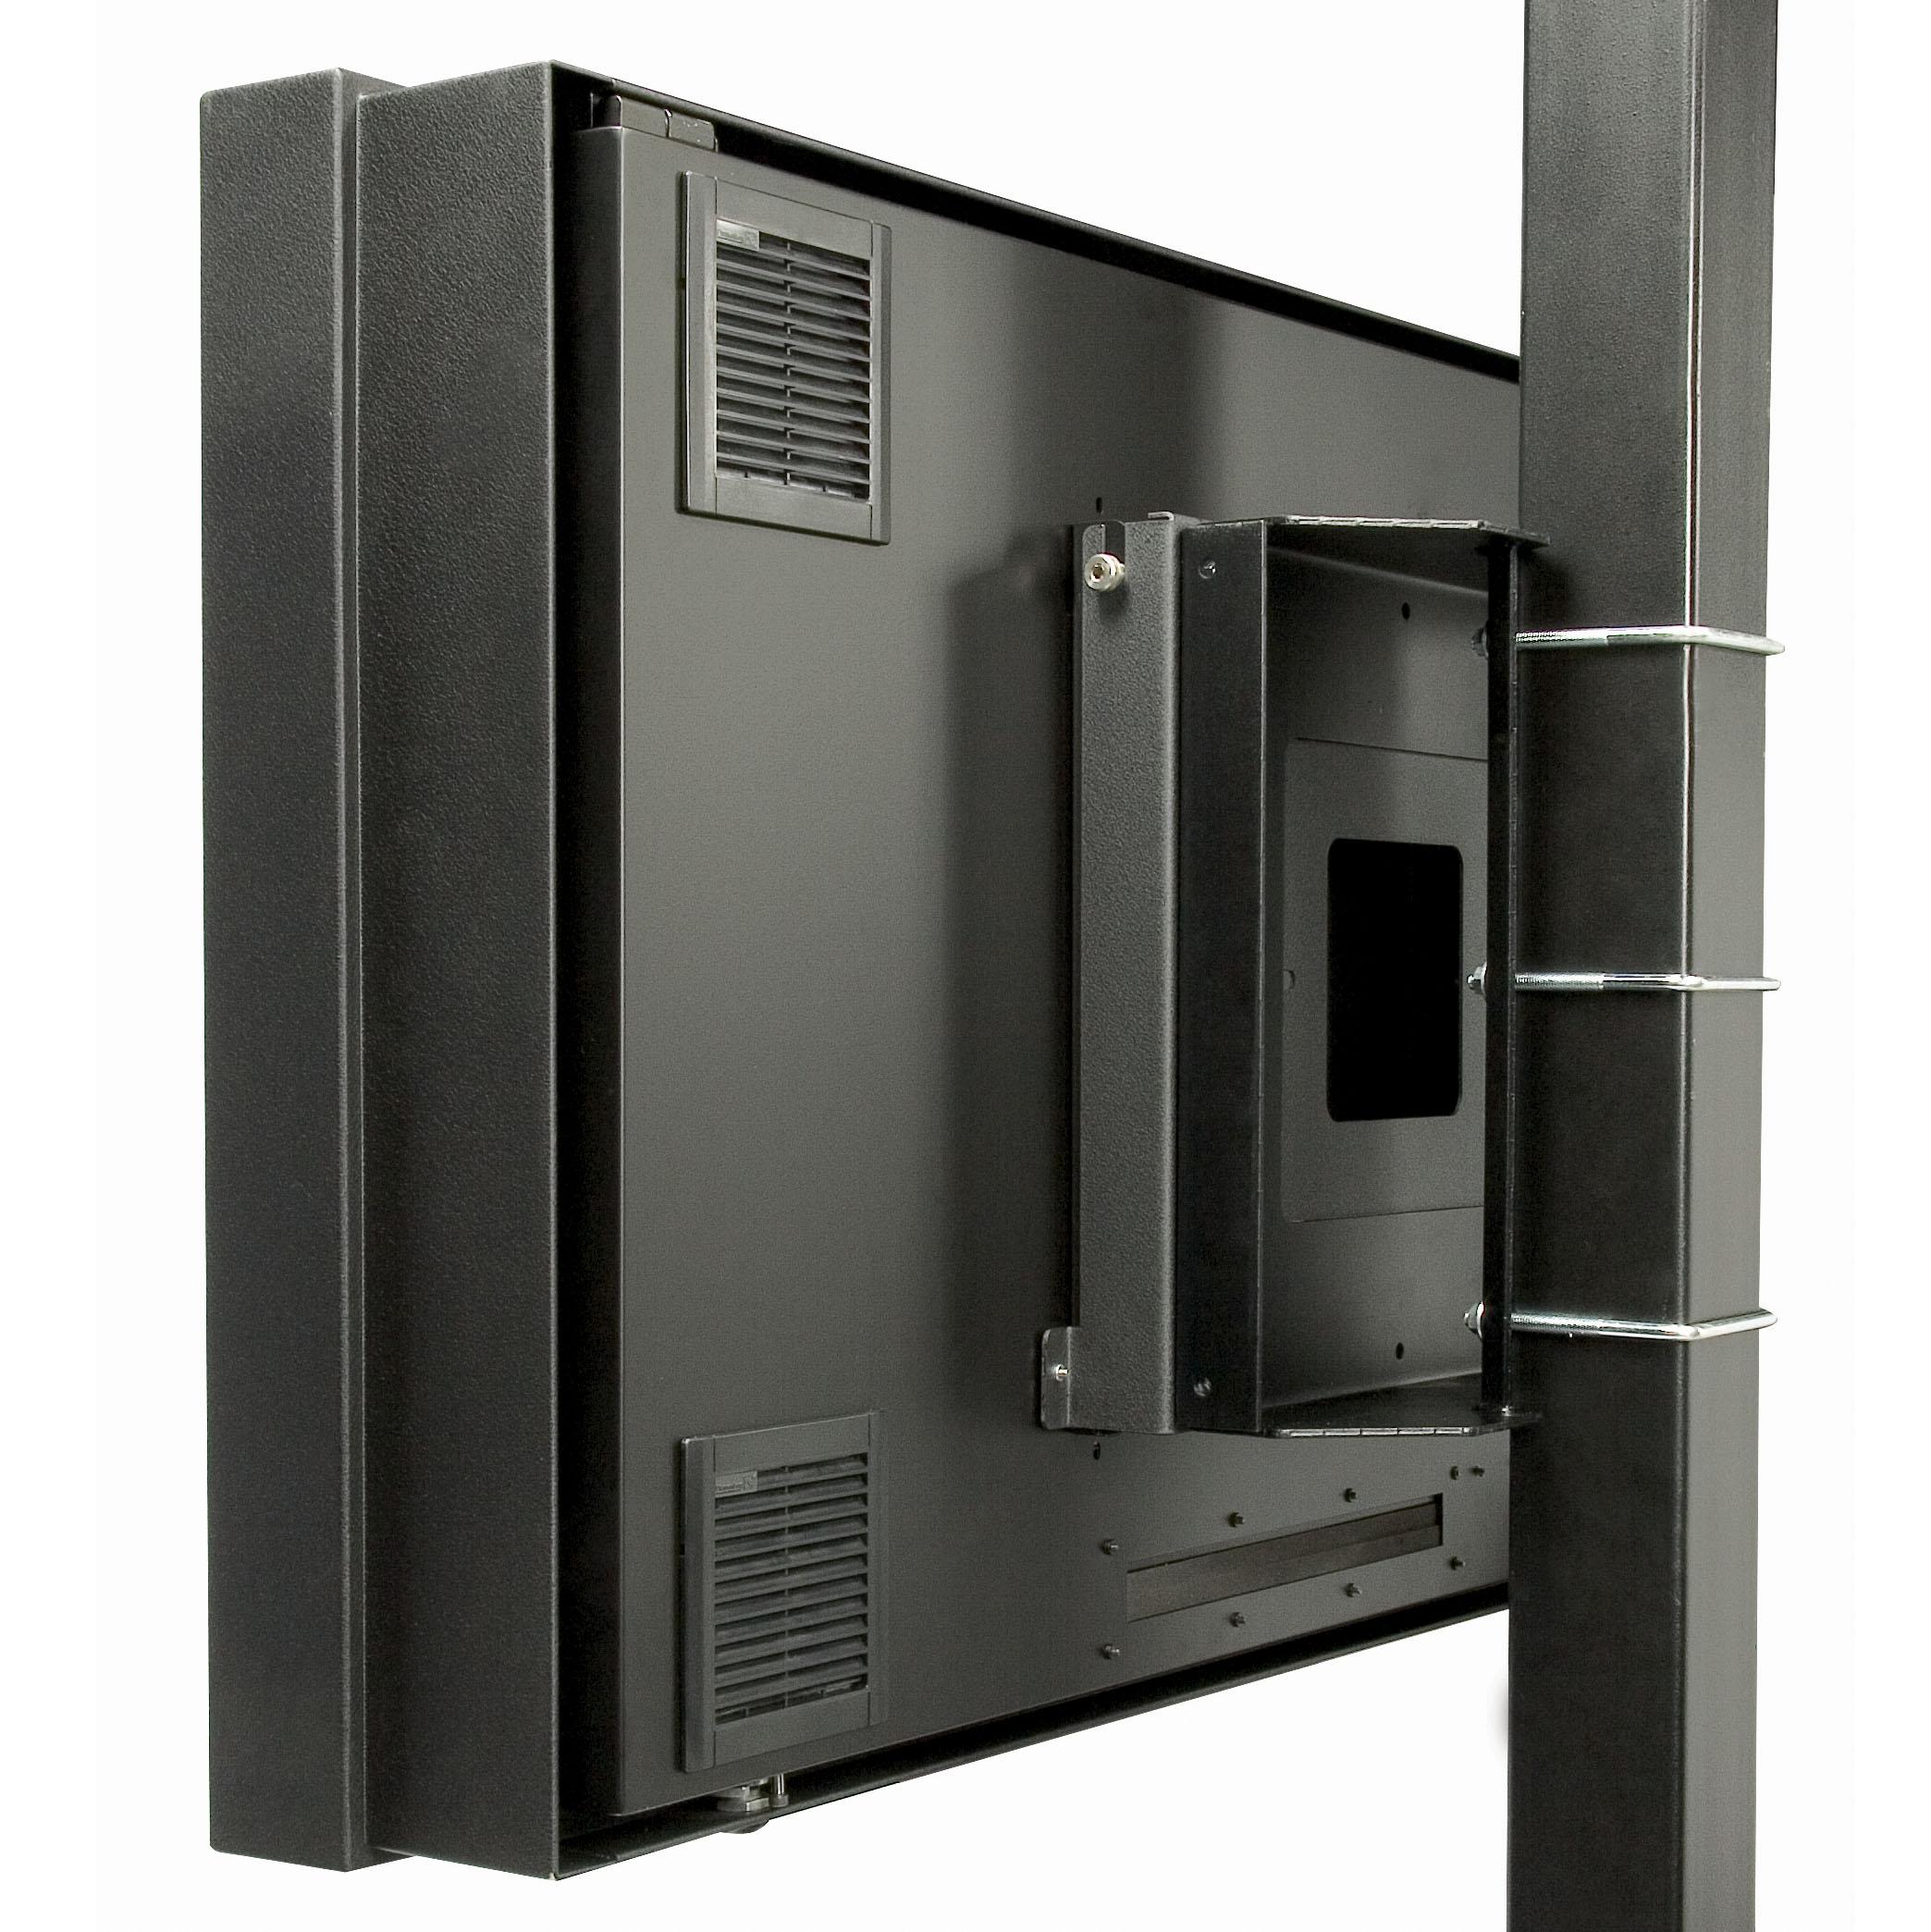 Post Mount Kit for Display Enclosure